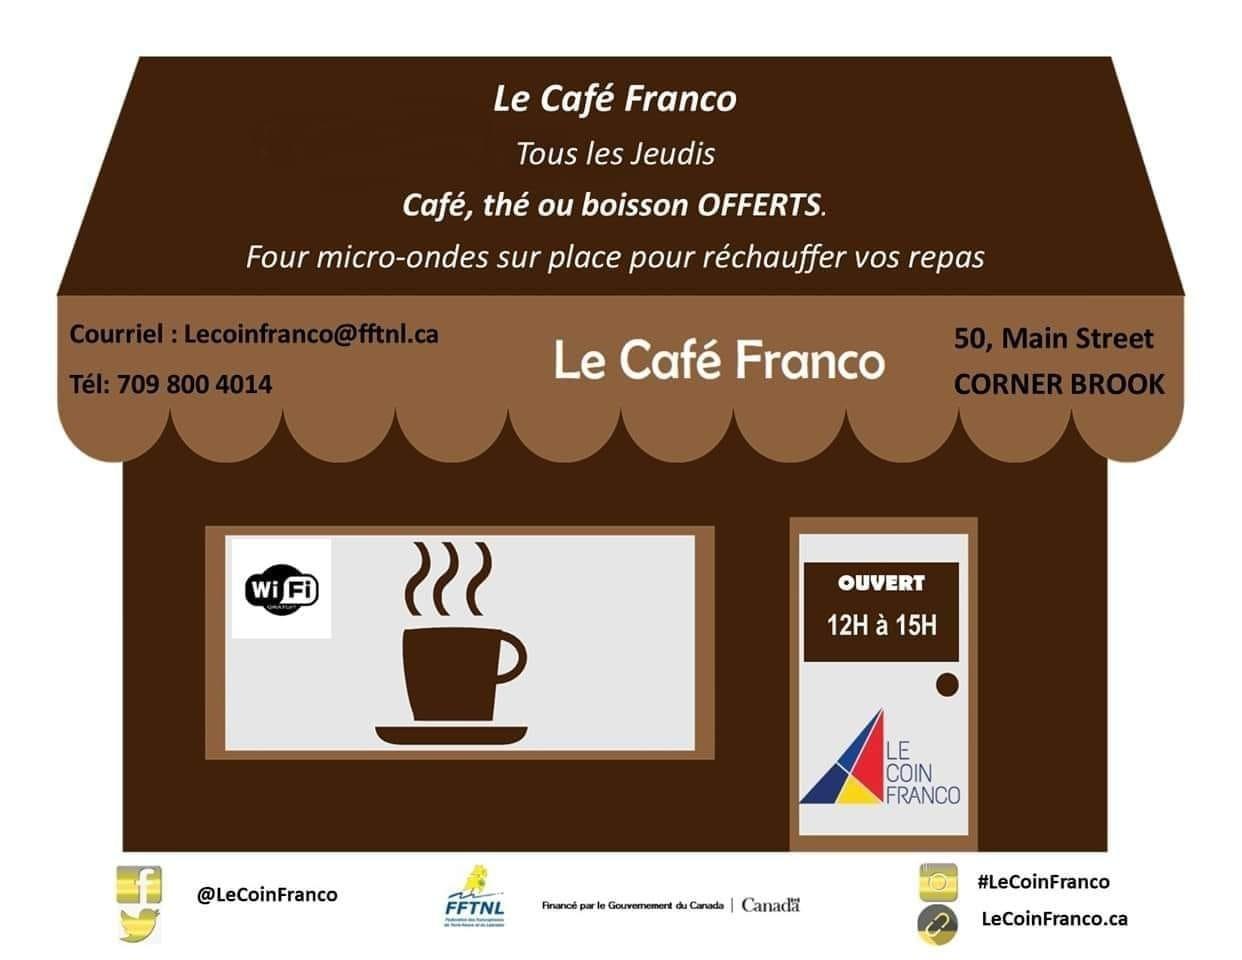 Le Café Franco